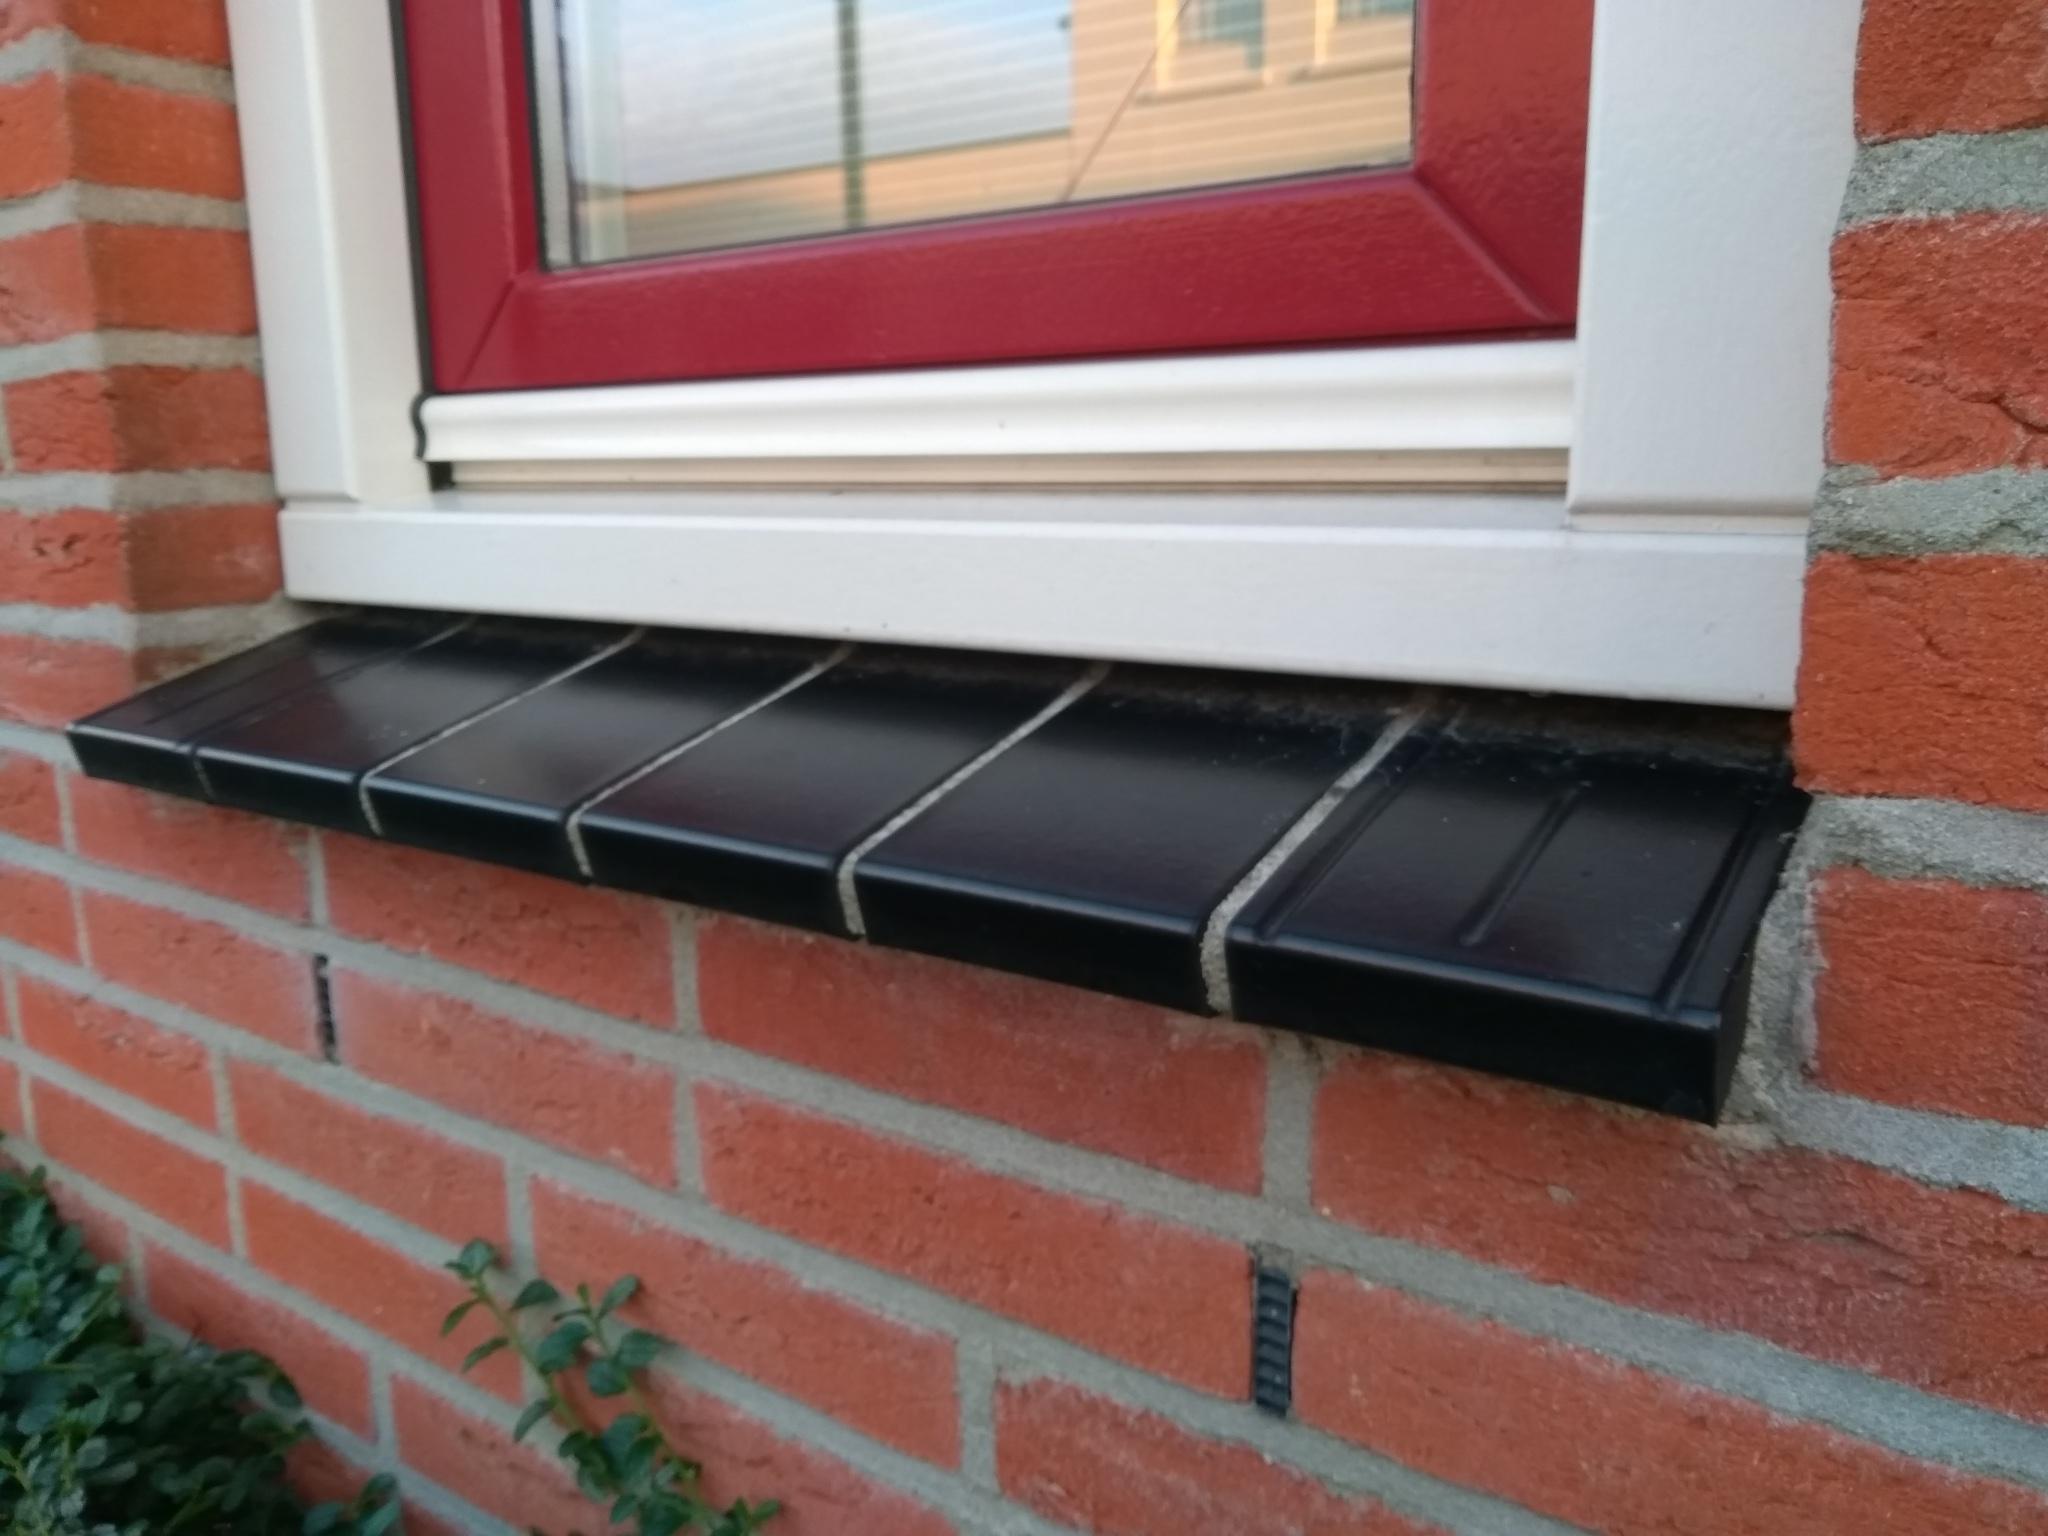 Vensterbank Tegels Buiten : Vensterbank tegels buiten voegen vensterbank werkspot ≥ buiten